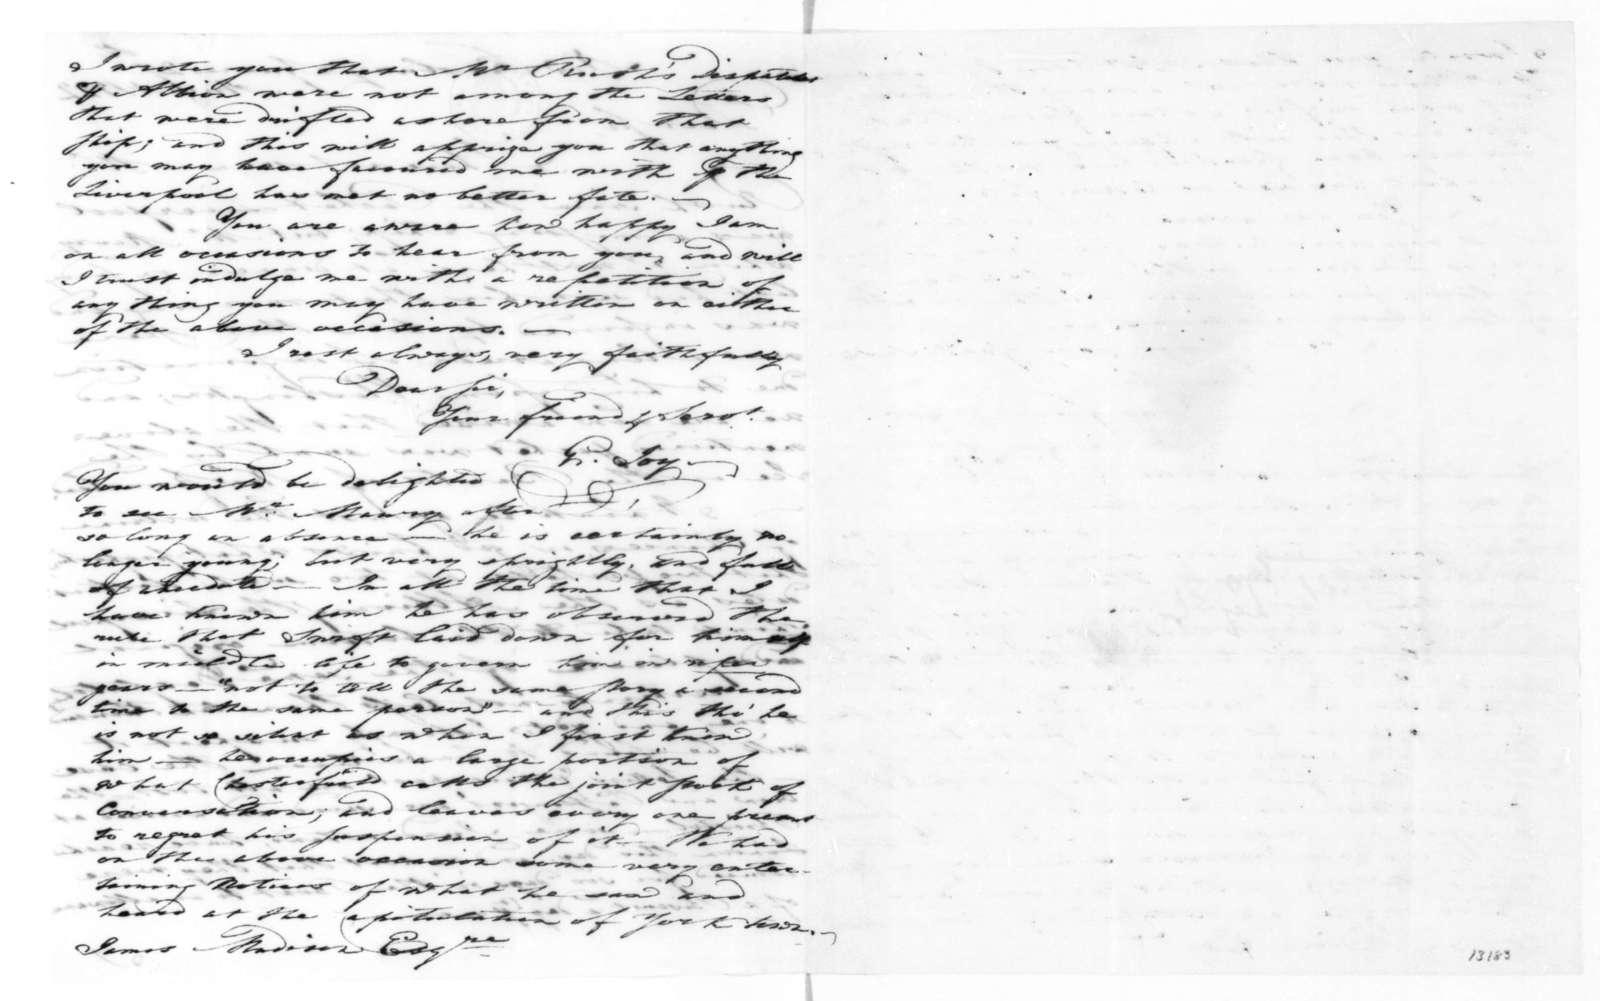 George Joy to James Madison, August 27, 1822.